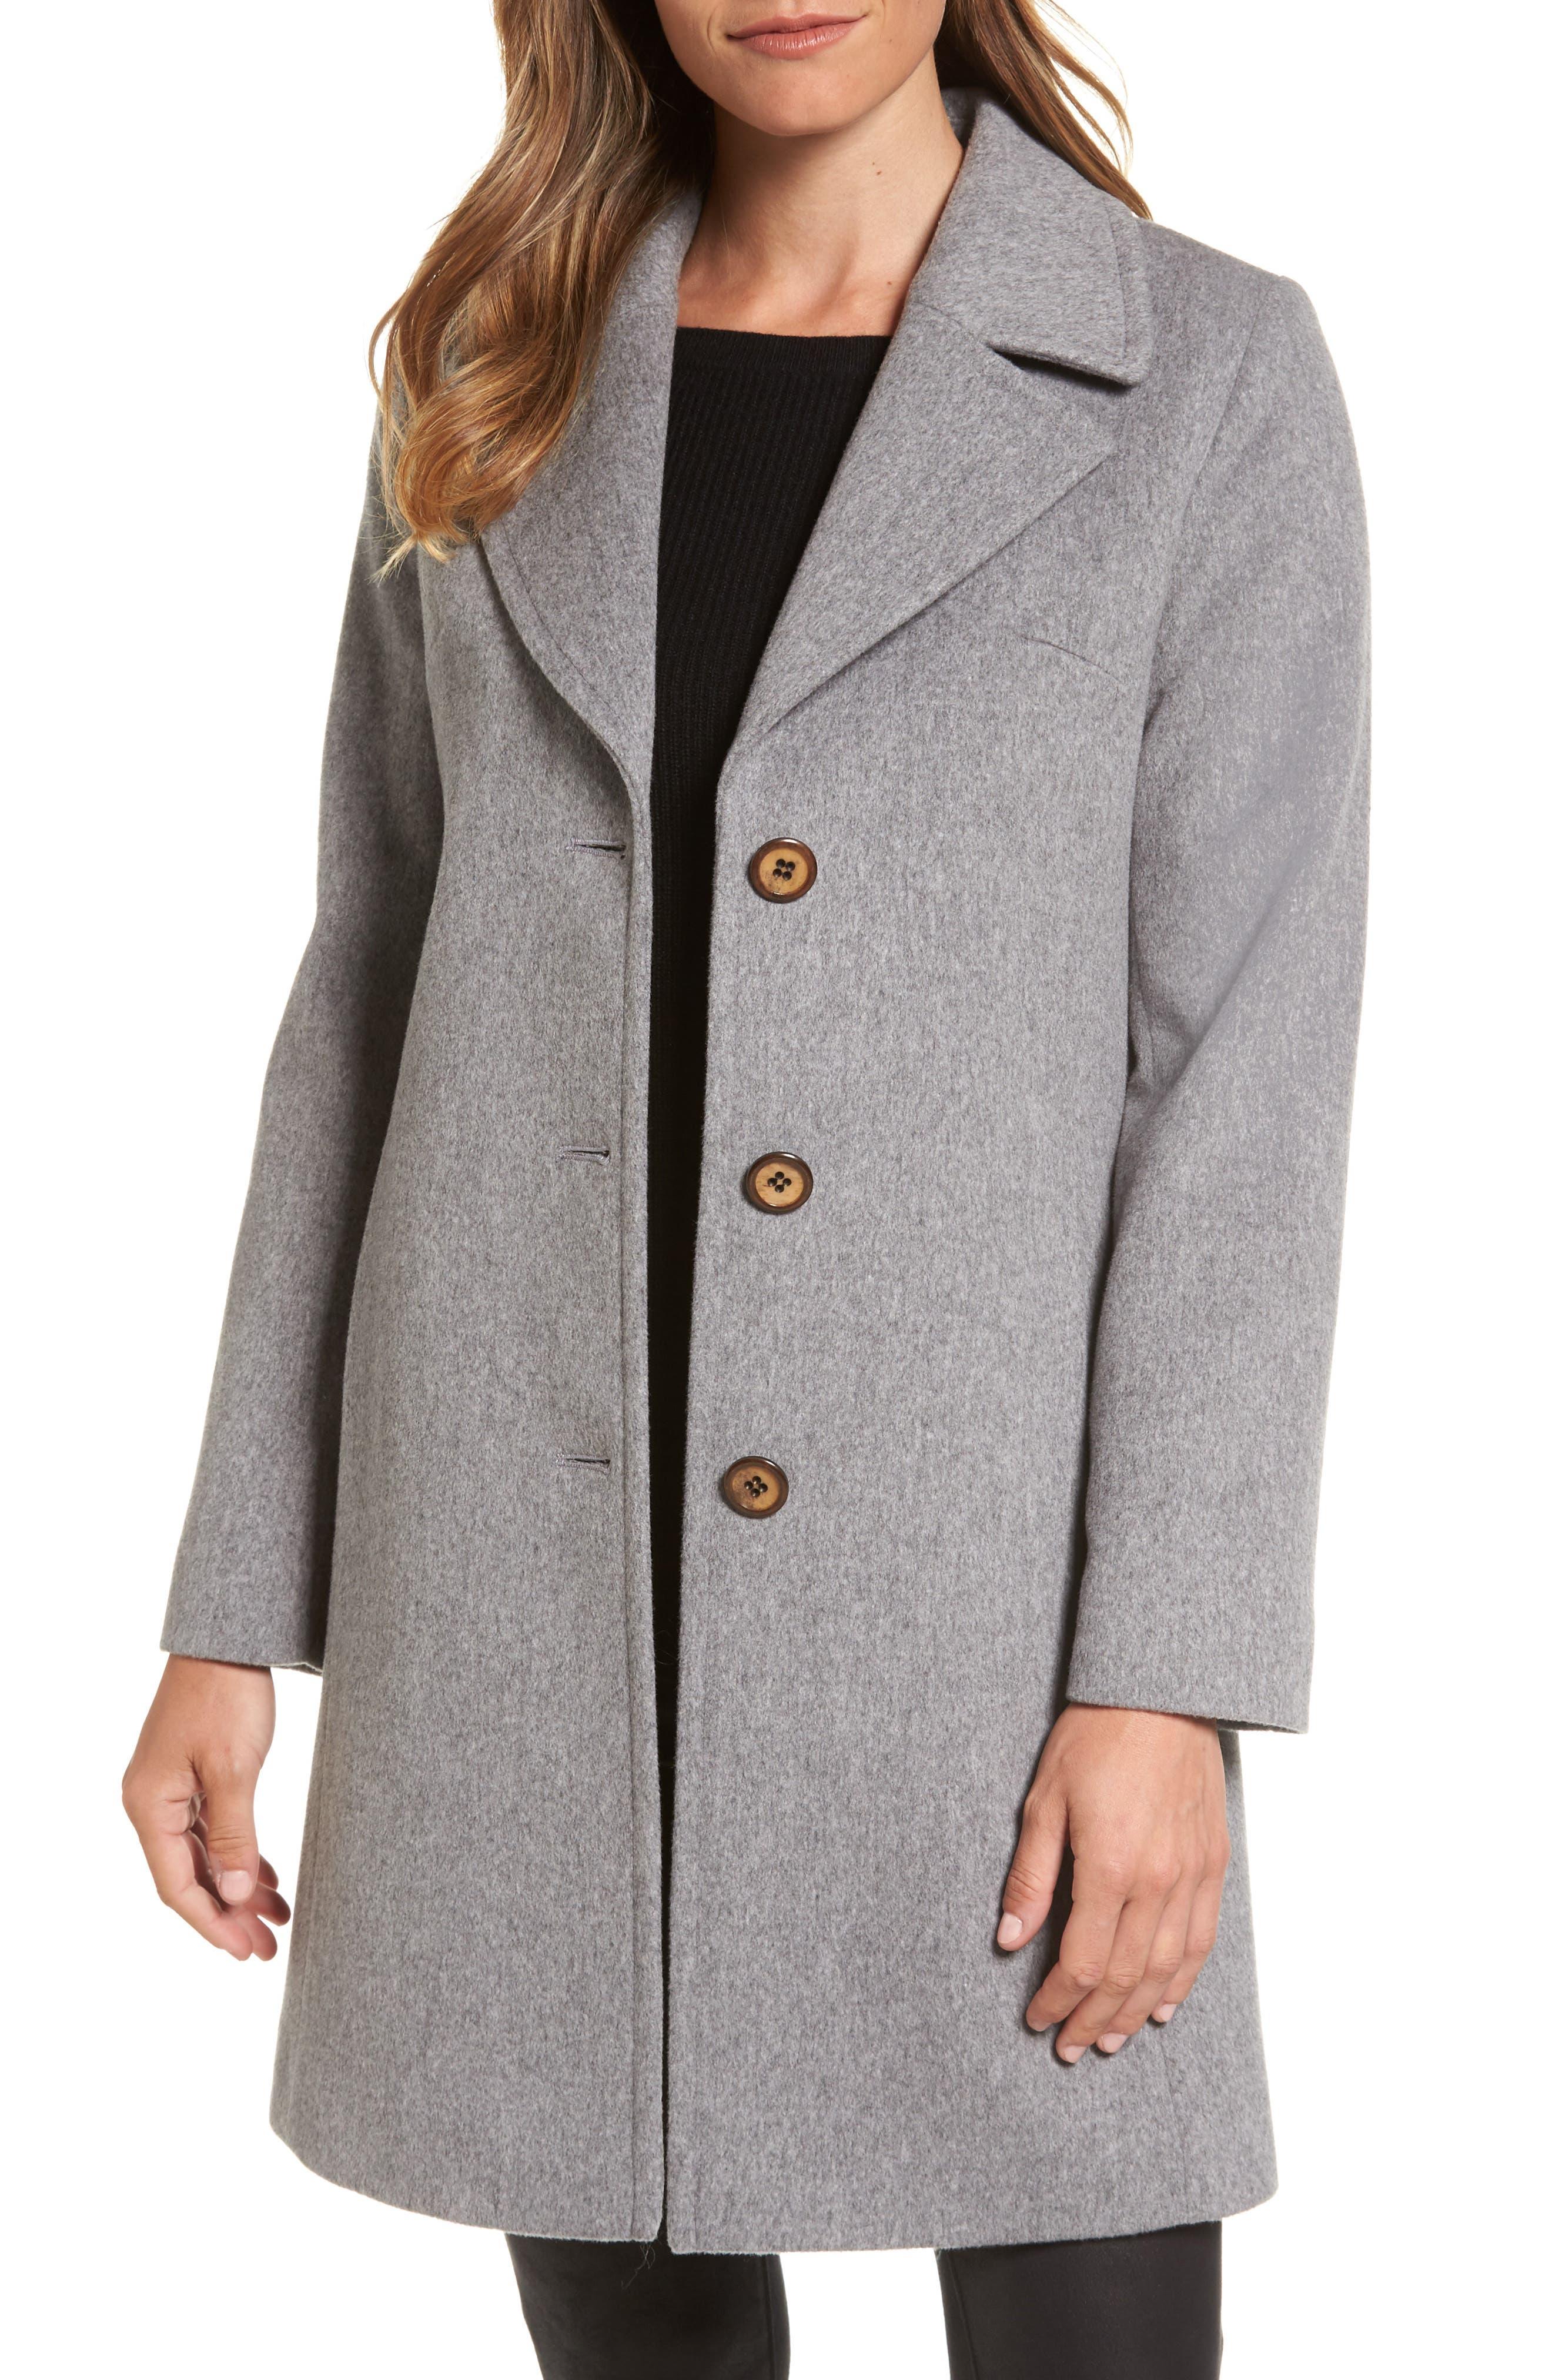 Alternate Image 1 Selected - Fleurette Notch Collar Wool Walking Coat (Regular & Petite)